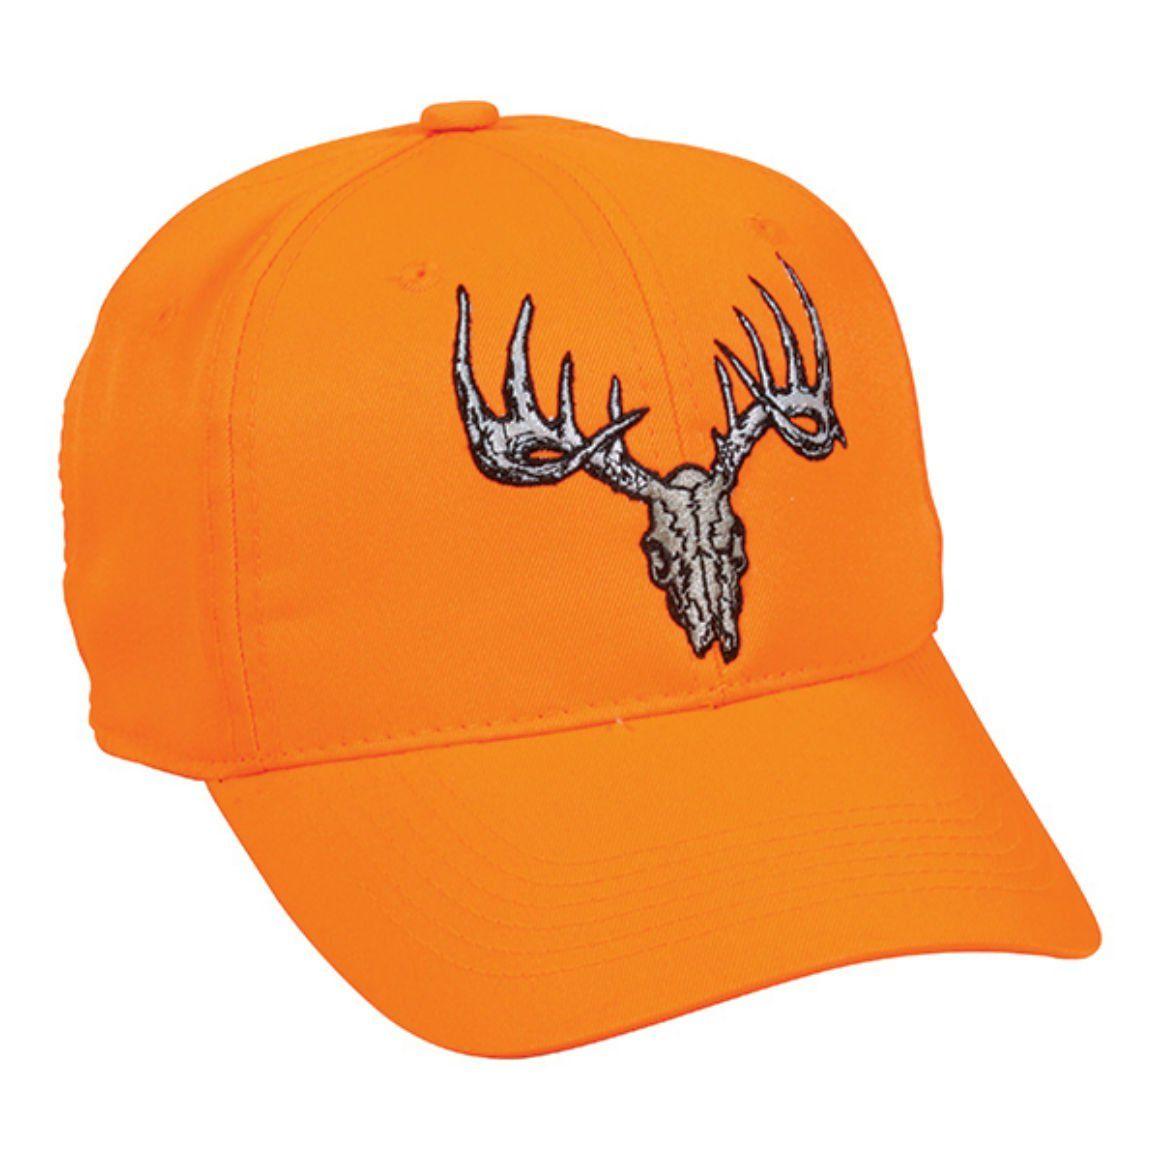 6947f3785 Blaze Orange Deer Skull Hunting Hat. Structured. Front: flat stitch  embroidery. Hook